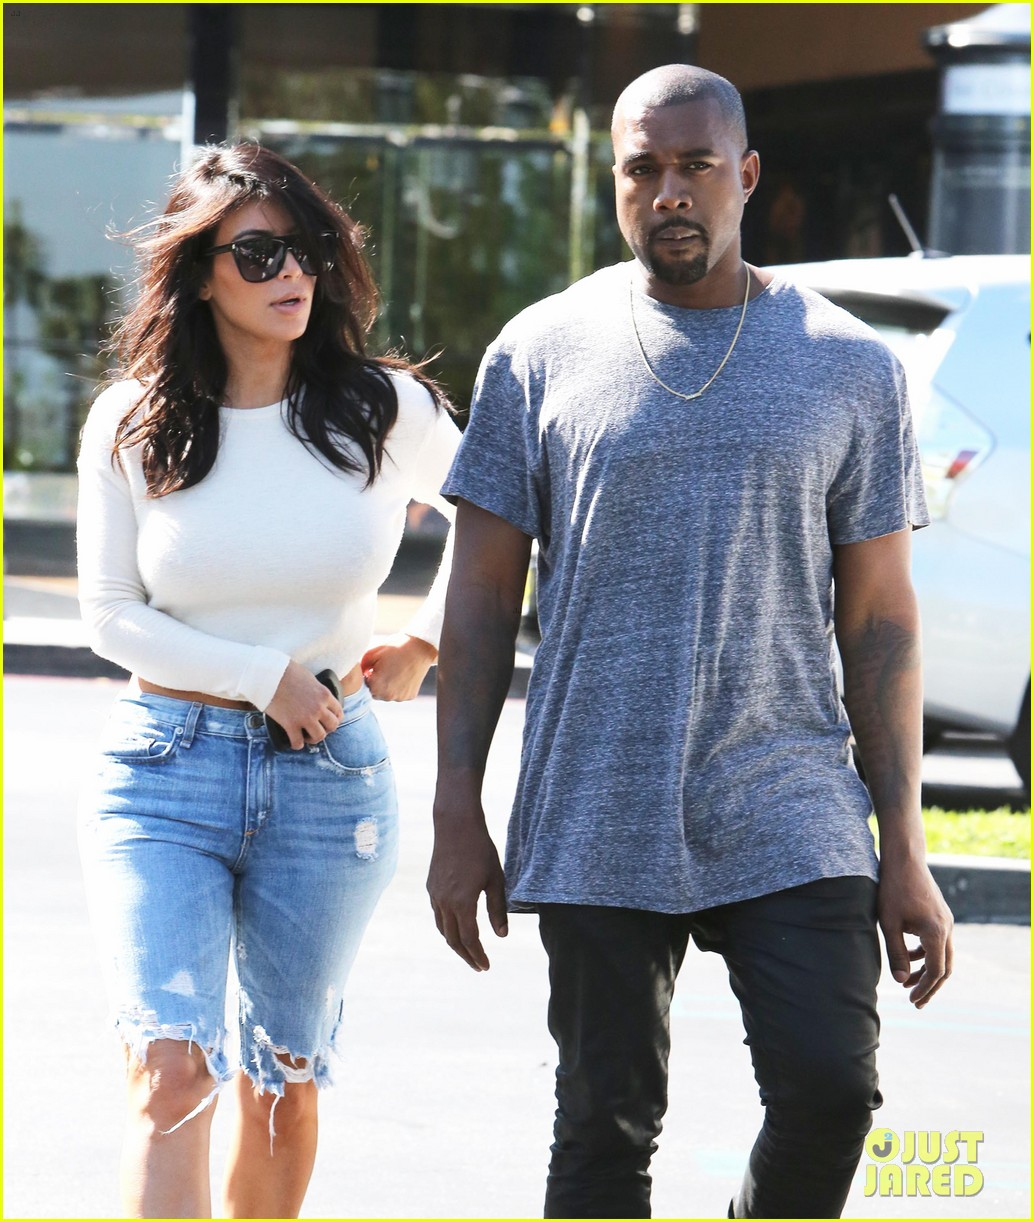 668aac13a637e Kim Kardashian Wears Open-Back Shirt for Sunday Date with Kanye West ...